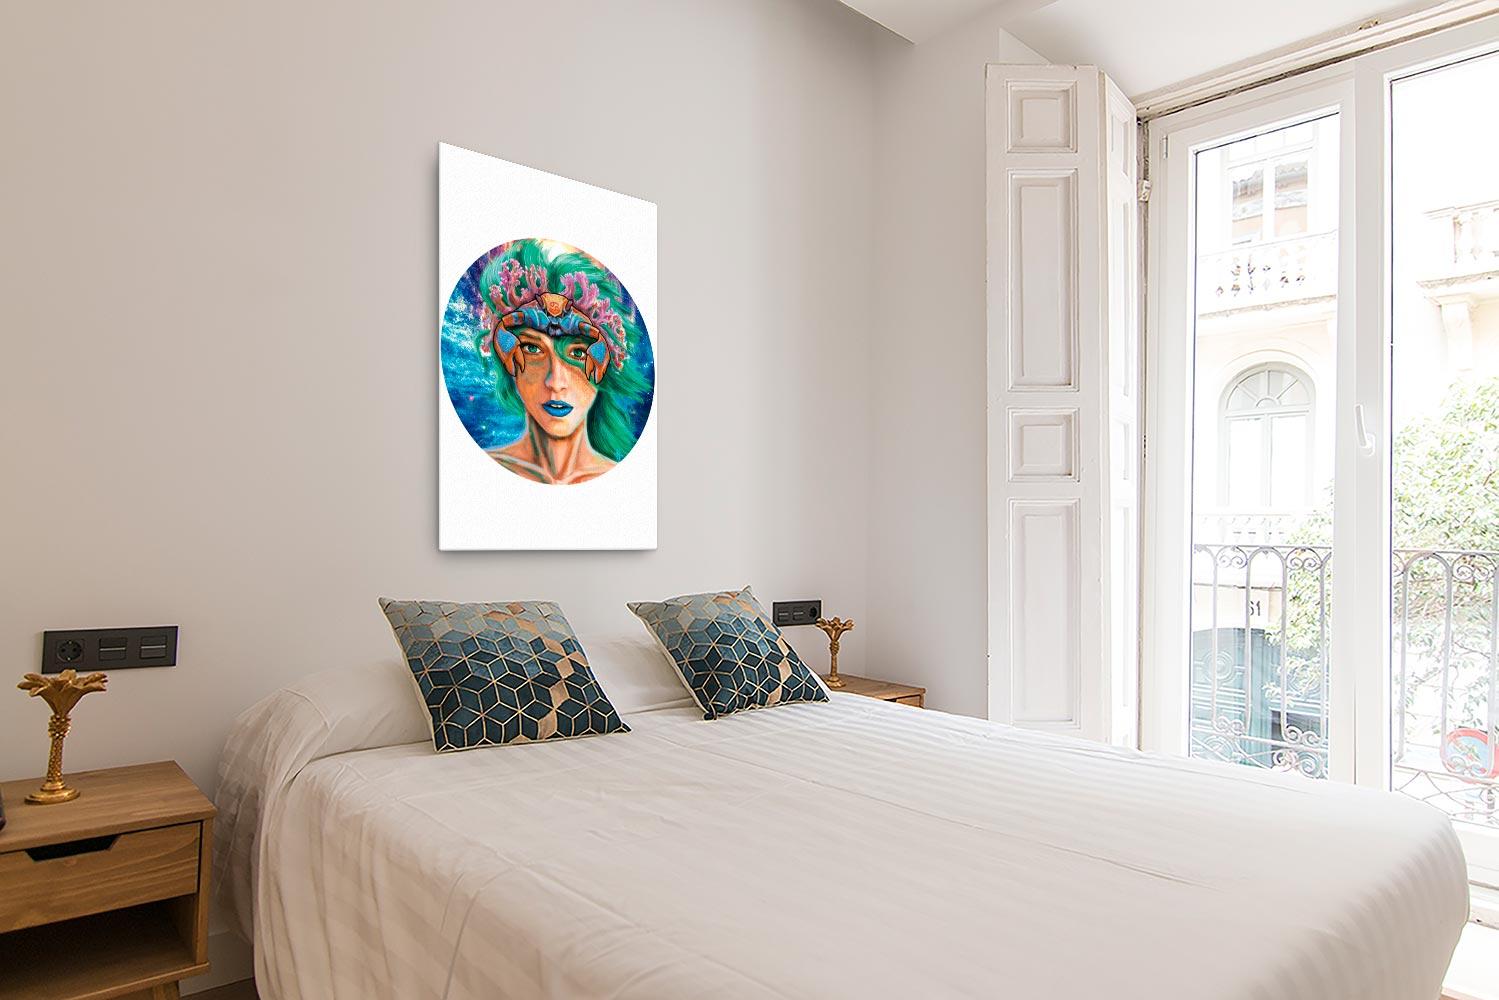 Reproducción de arte en lienzo - dormitorio con balcón - La Fortaleza de Cancer - Diseño Digital - Zodiaco - Ilustración -pintado por Adrian Pagador